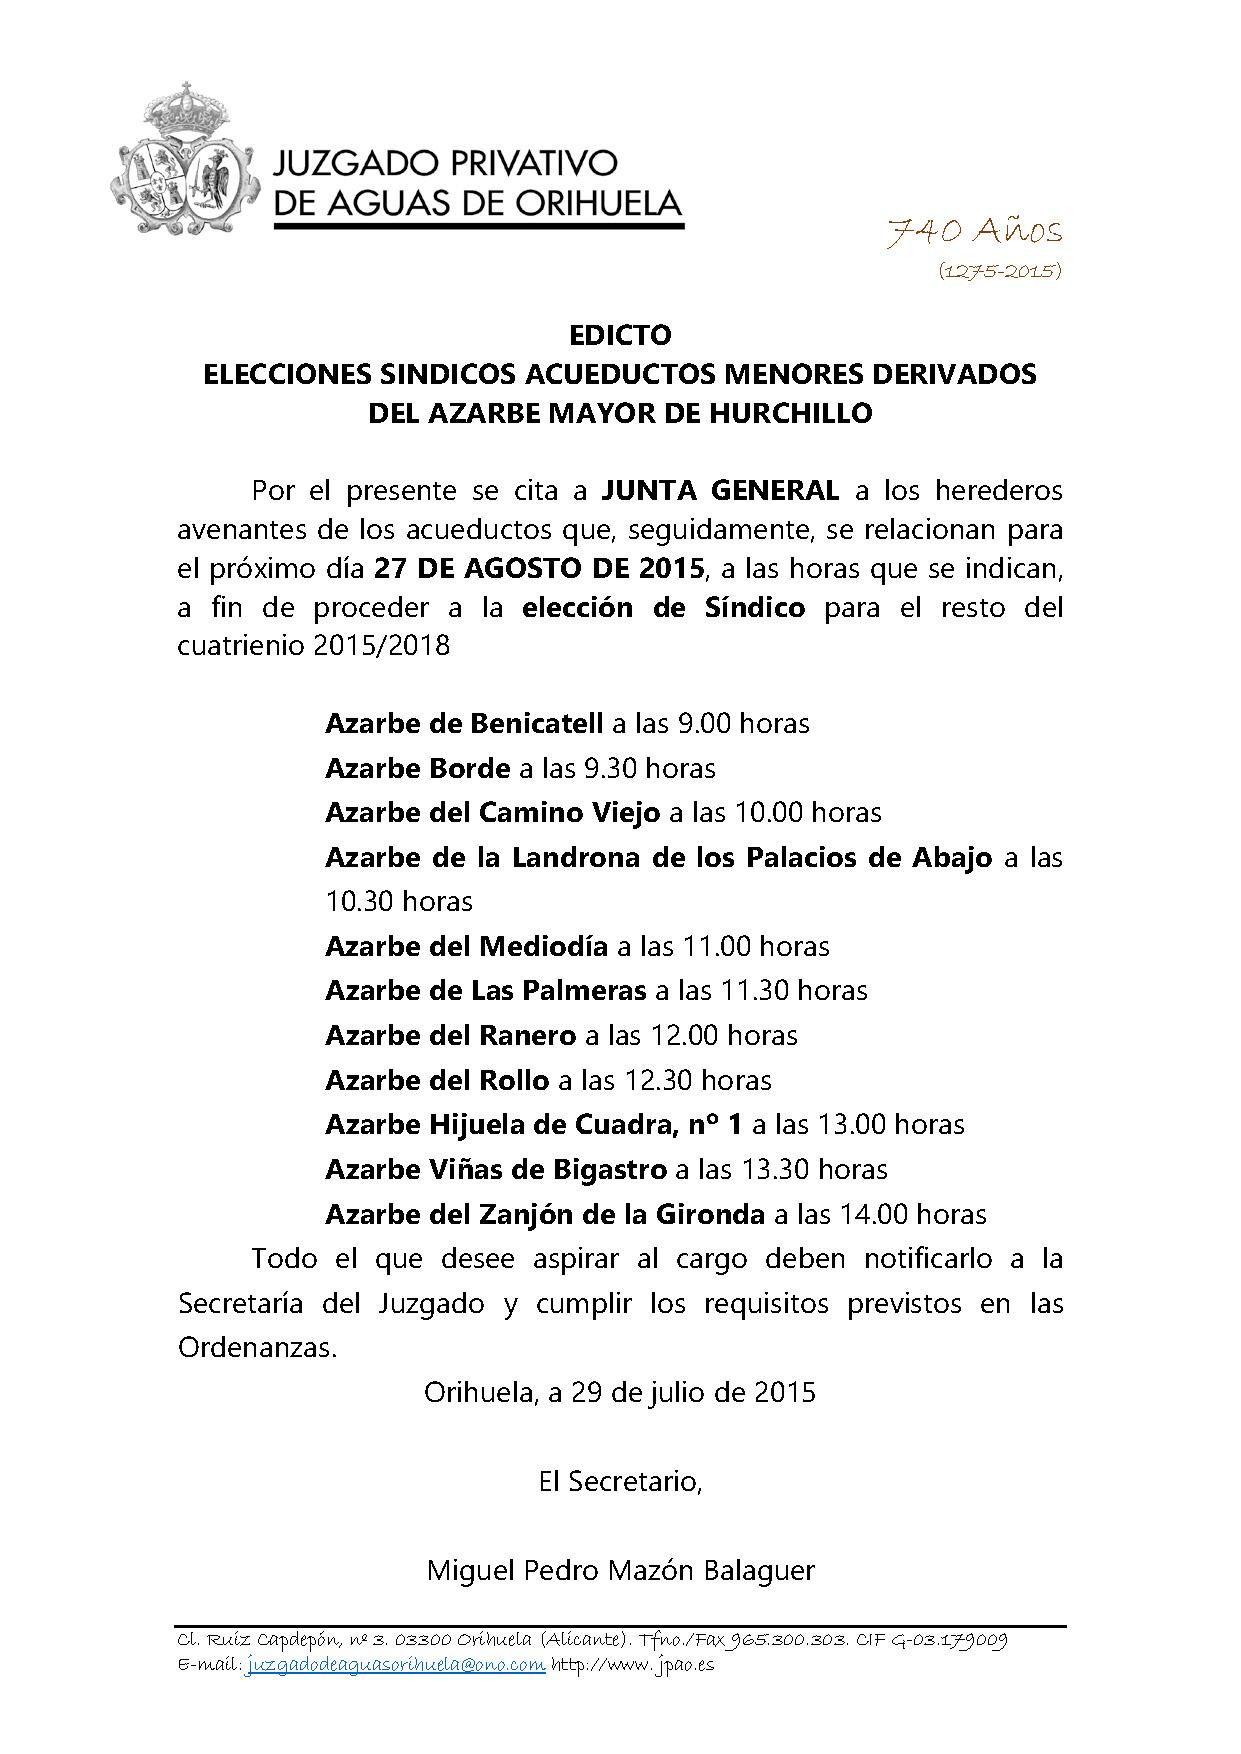 112 2015 EDICTO CONVOCATORIA ELECCIONES